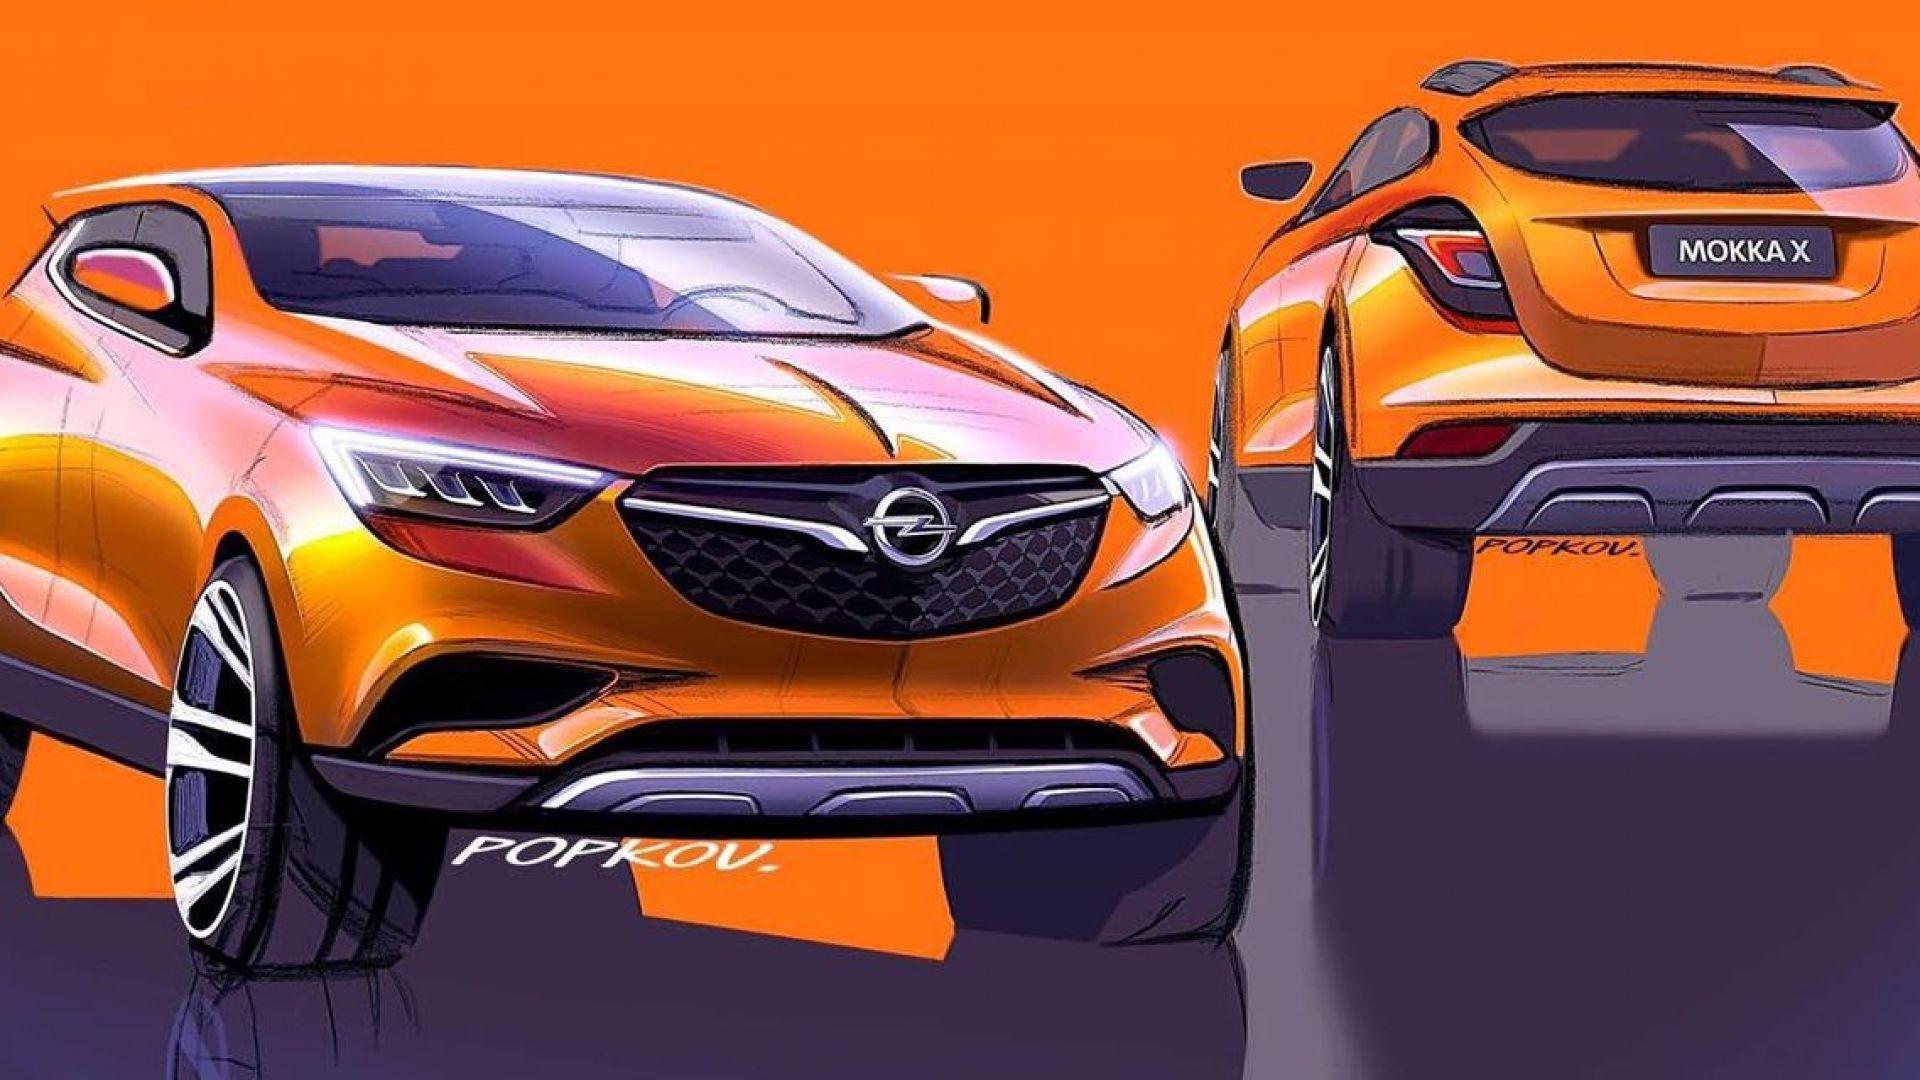 Nuova Opel Mokka X 2019: anteprima, motori, prezzo - MotorBox